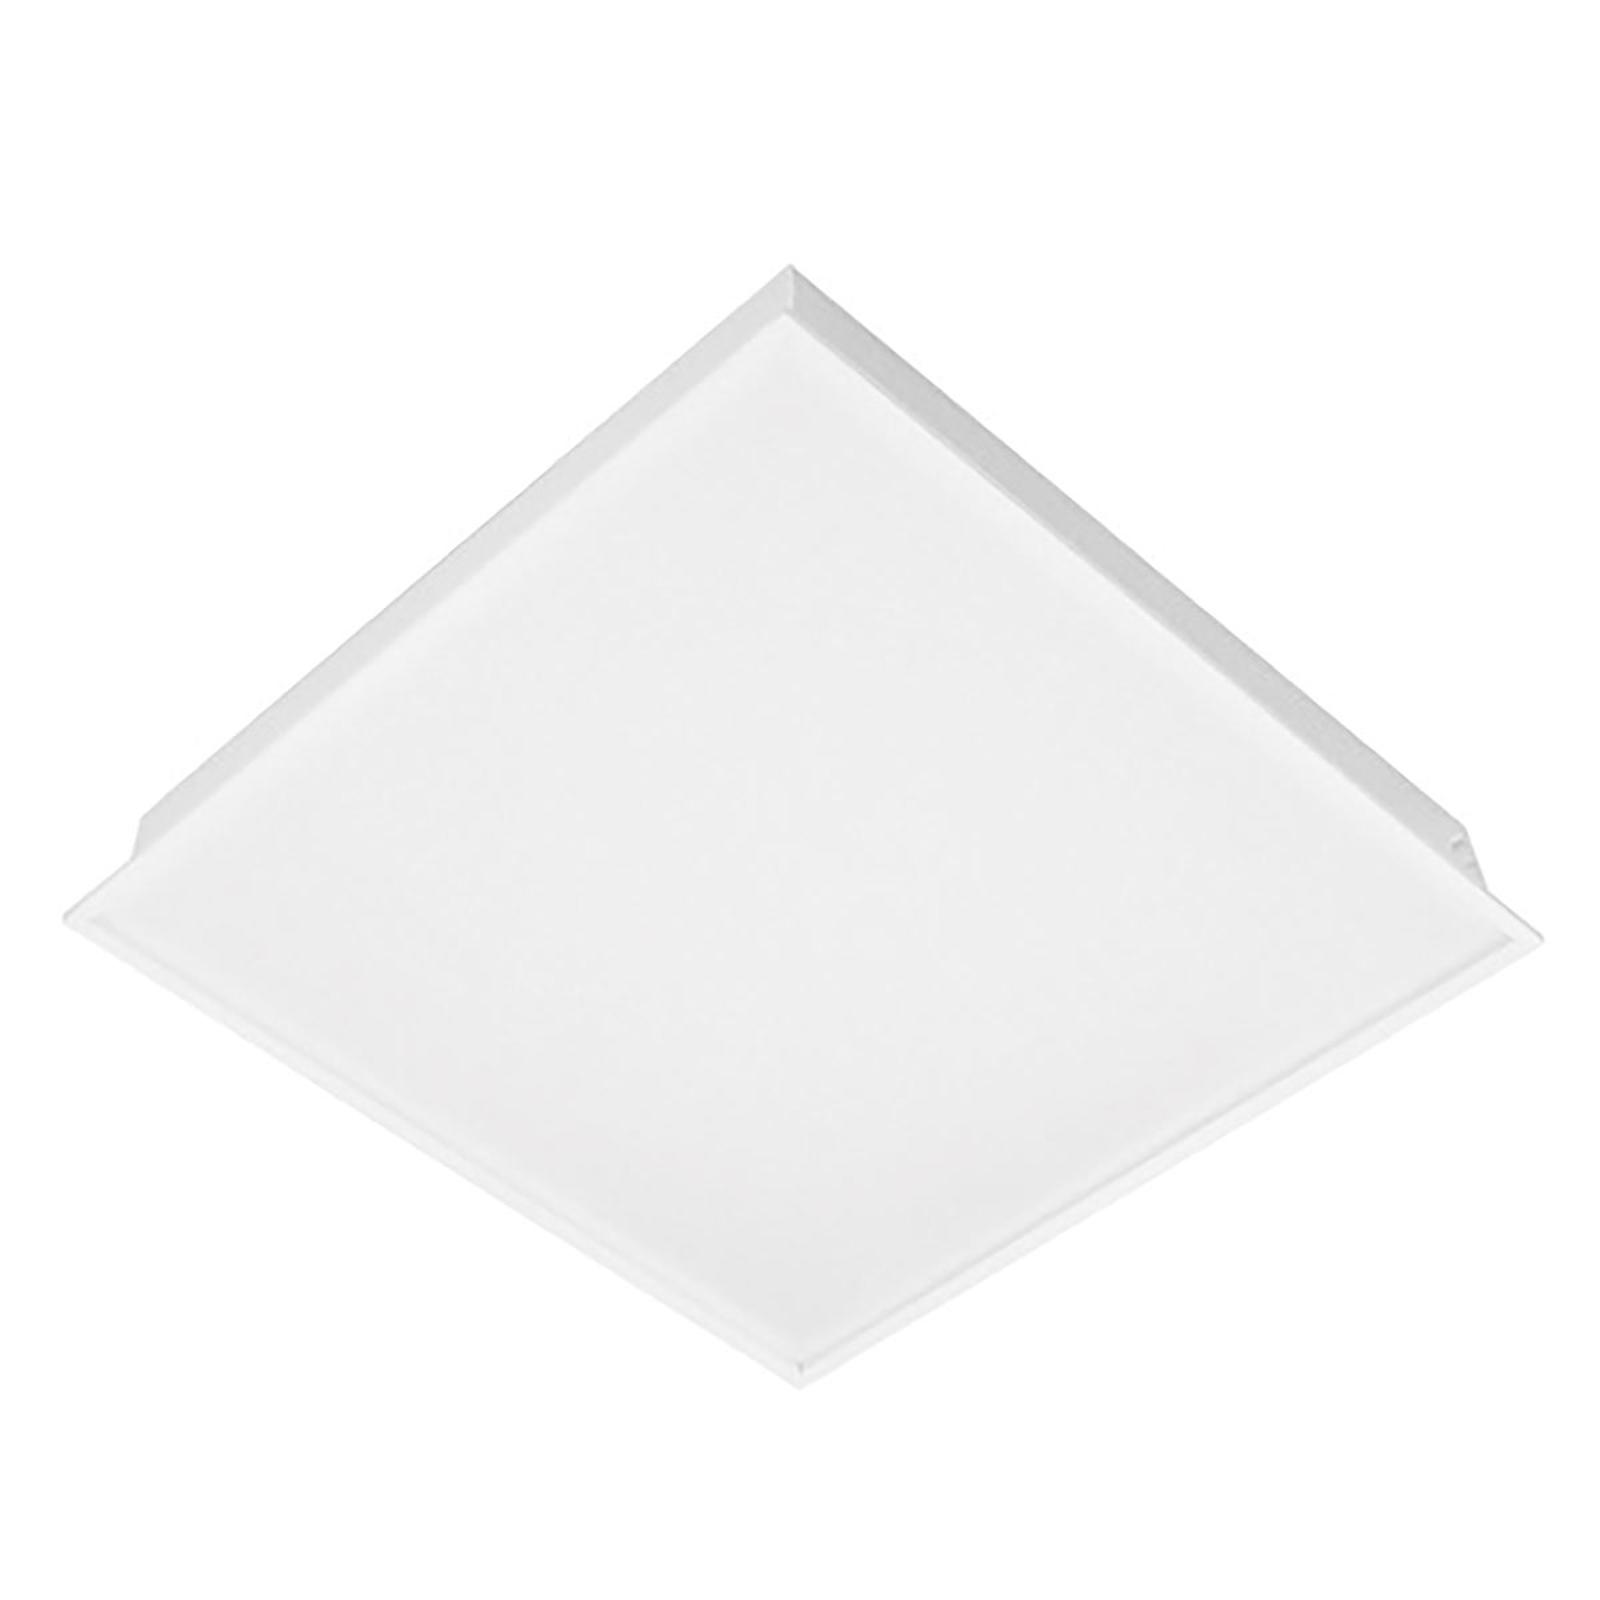 LED-Einlegepanel IBP PMMA-Abdeckung, 32W, 4.000K